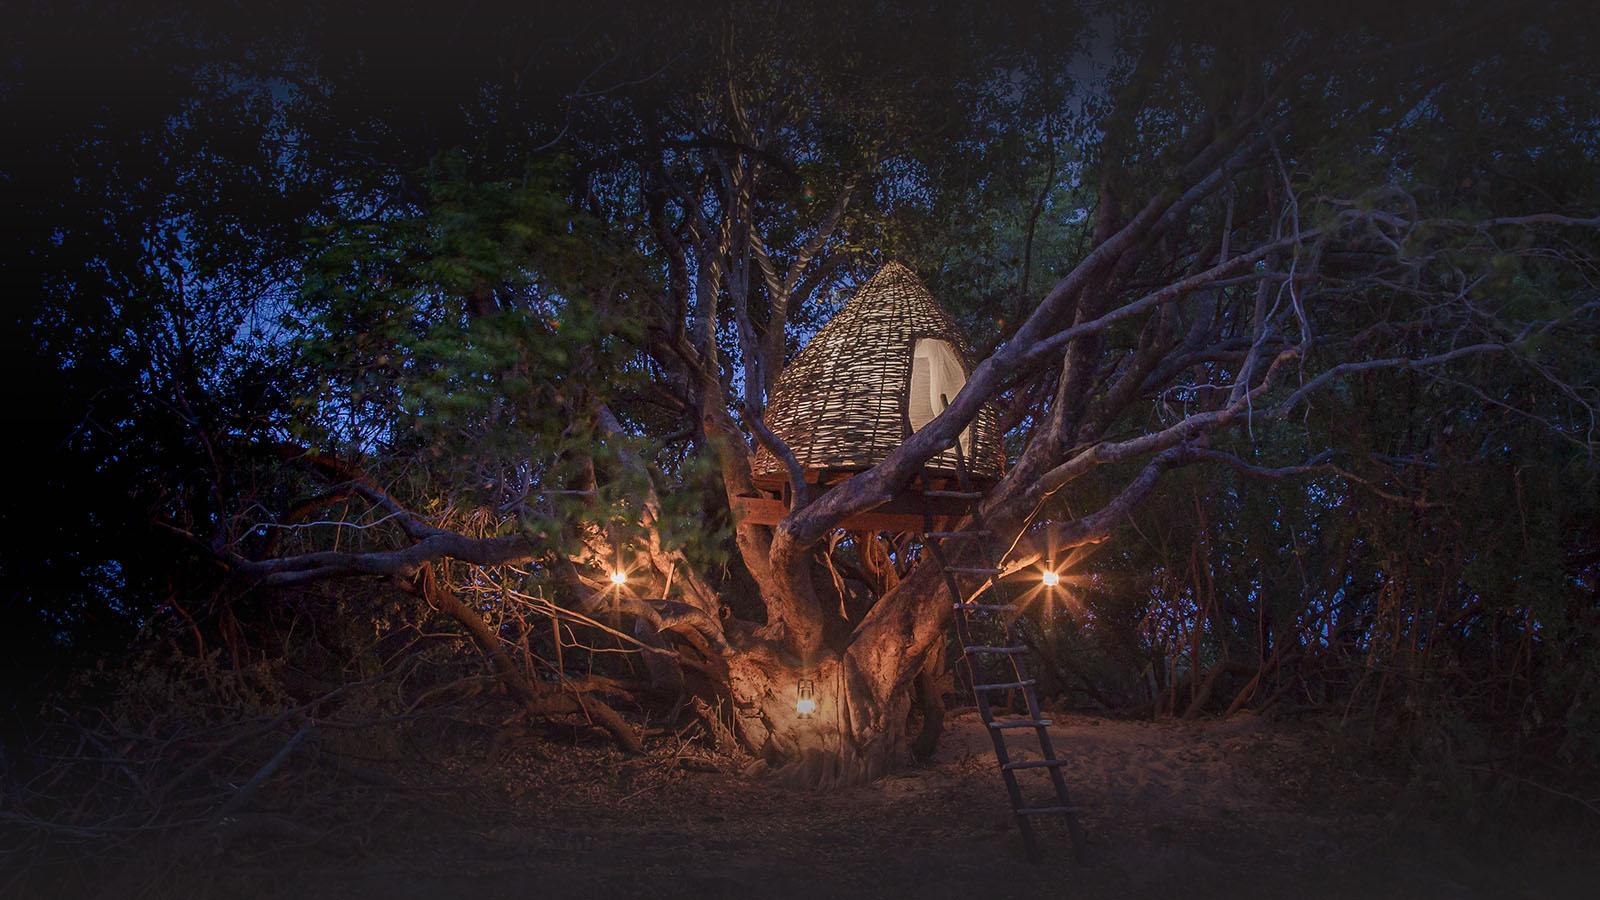 kaingu safari lodge zambia-in-style-safari-packages-lodges-explore-kafue-national-park-tree-house